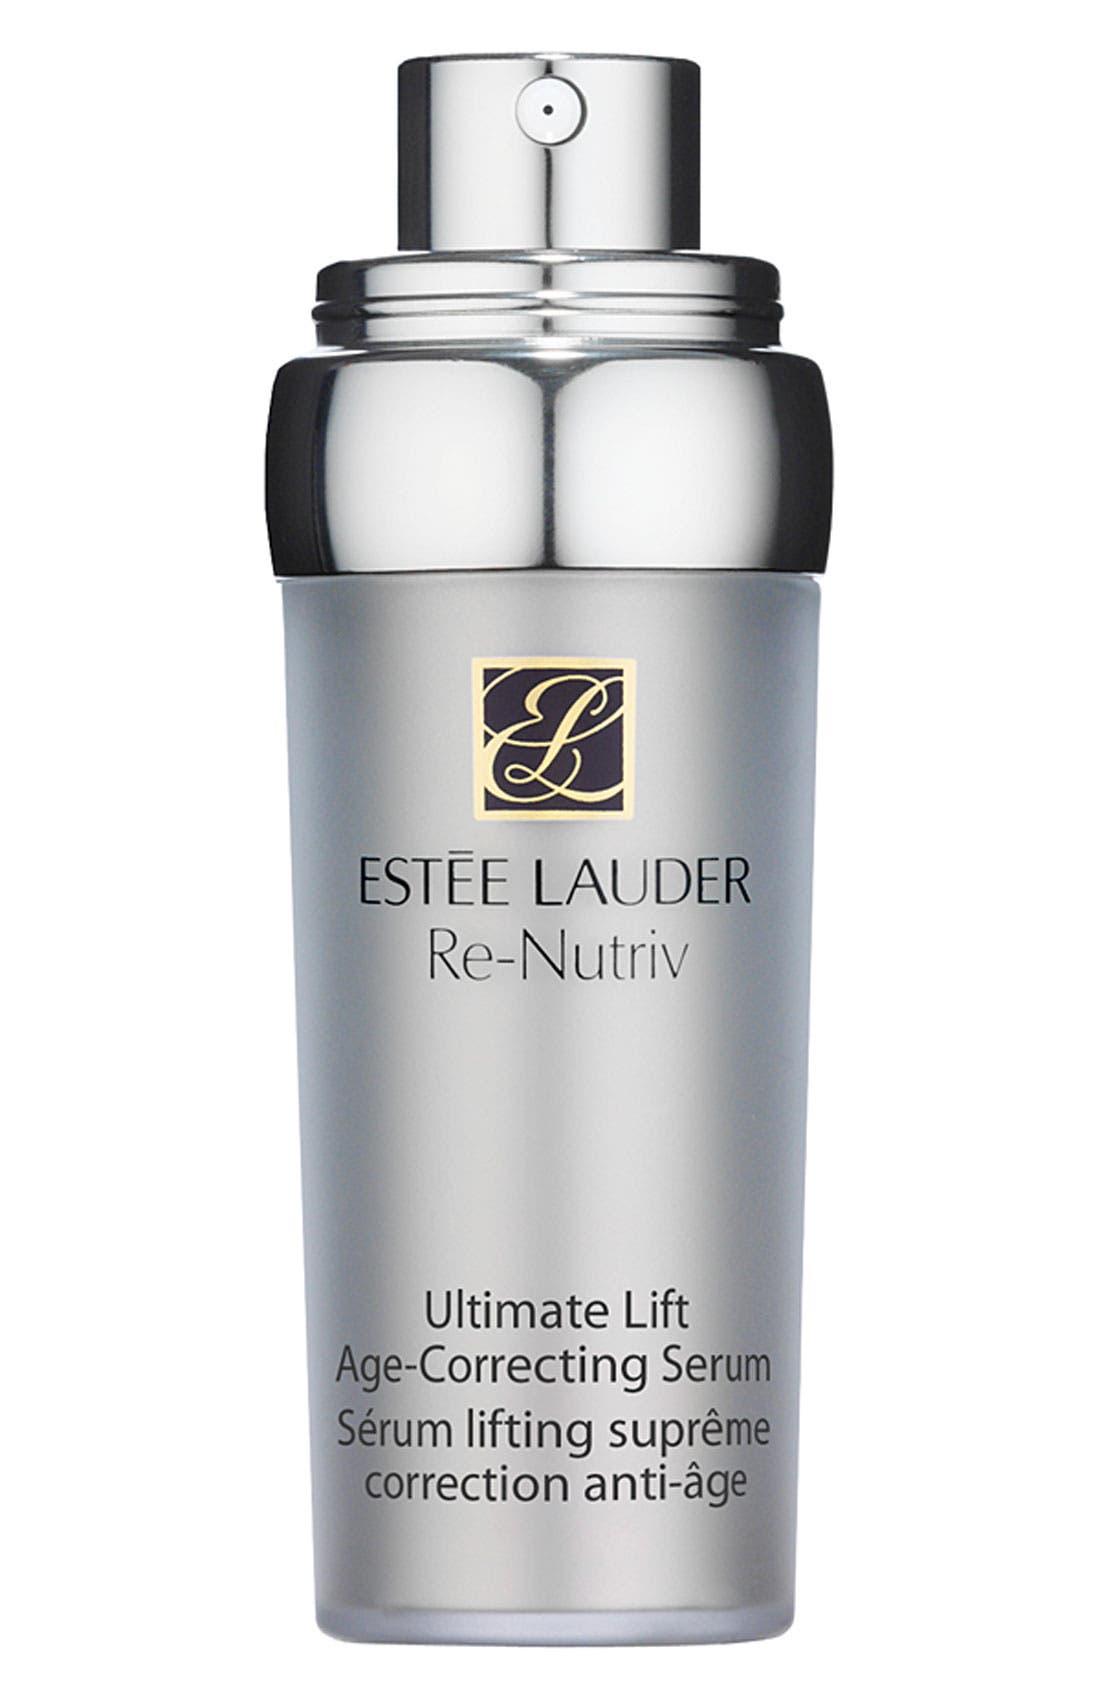 Re-Nutriv Ultimate Lift Age-Correcting Serum